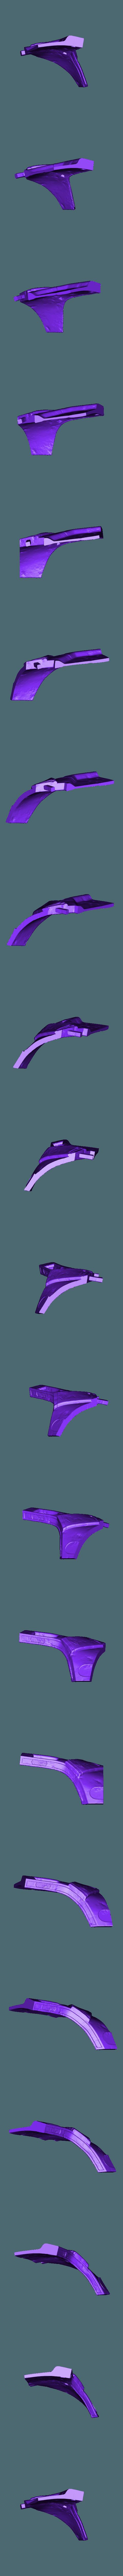 Armory_Damaged_Print33.obj Download OBJ file Armory - Knights of Ren Helmet (damaged), 3D print model • 3D print design, 3D-mon